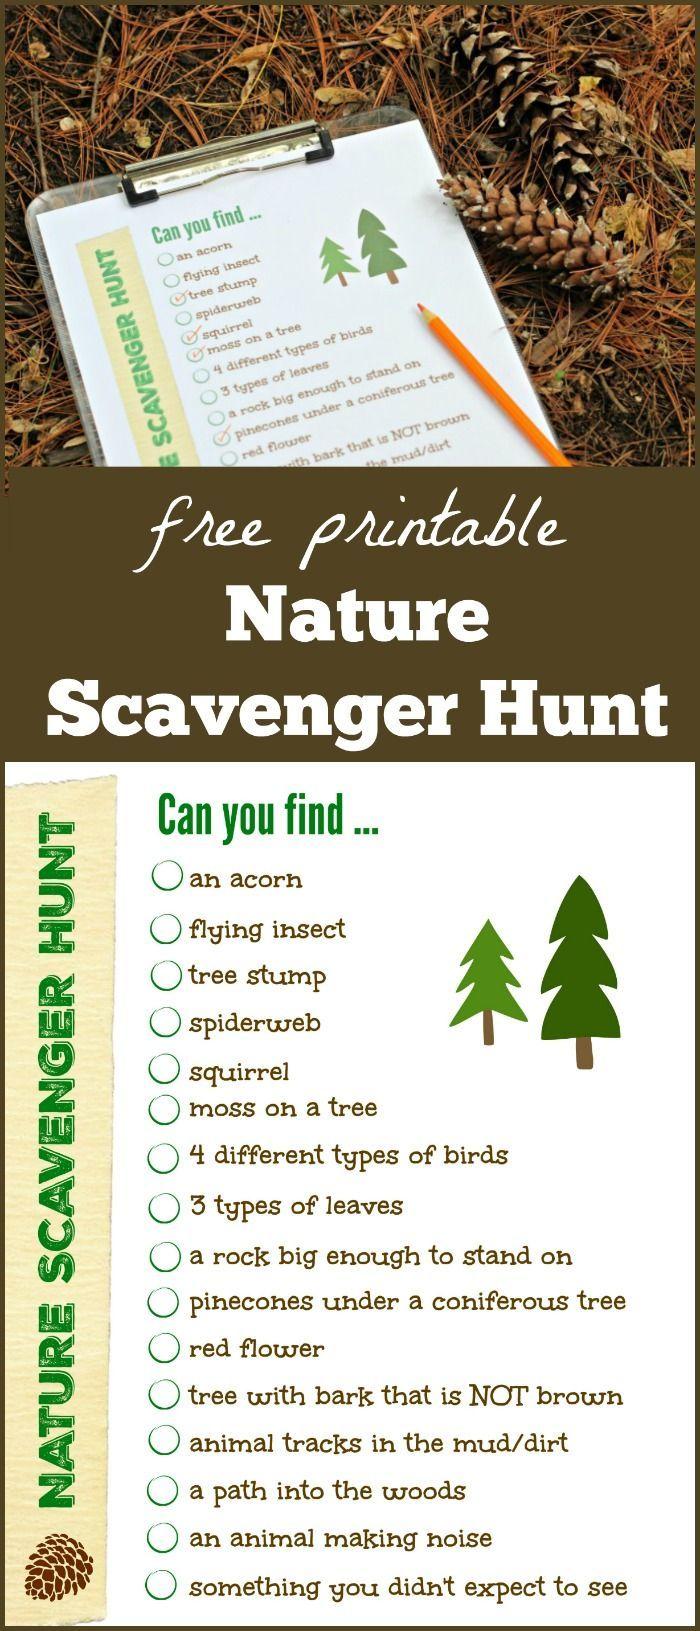 nature scavenger hunt free printable list nature scavenger